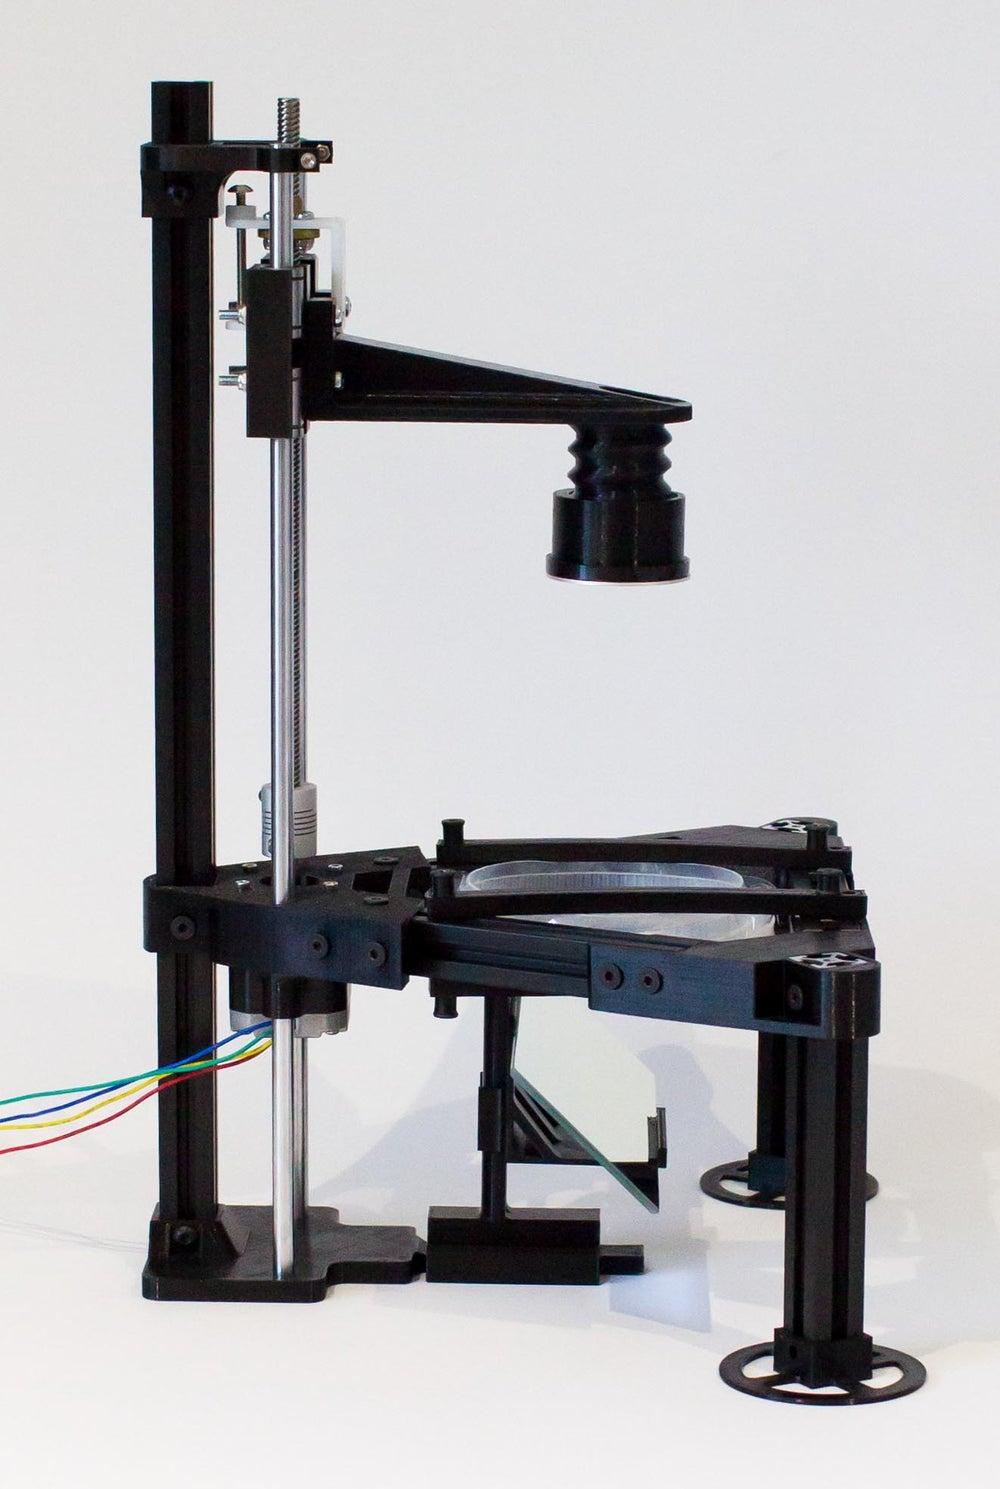 Image of Tricera DLP Resin 3D Printer